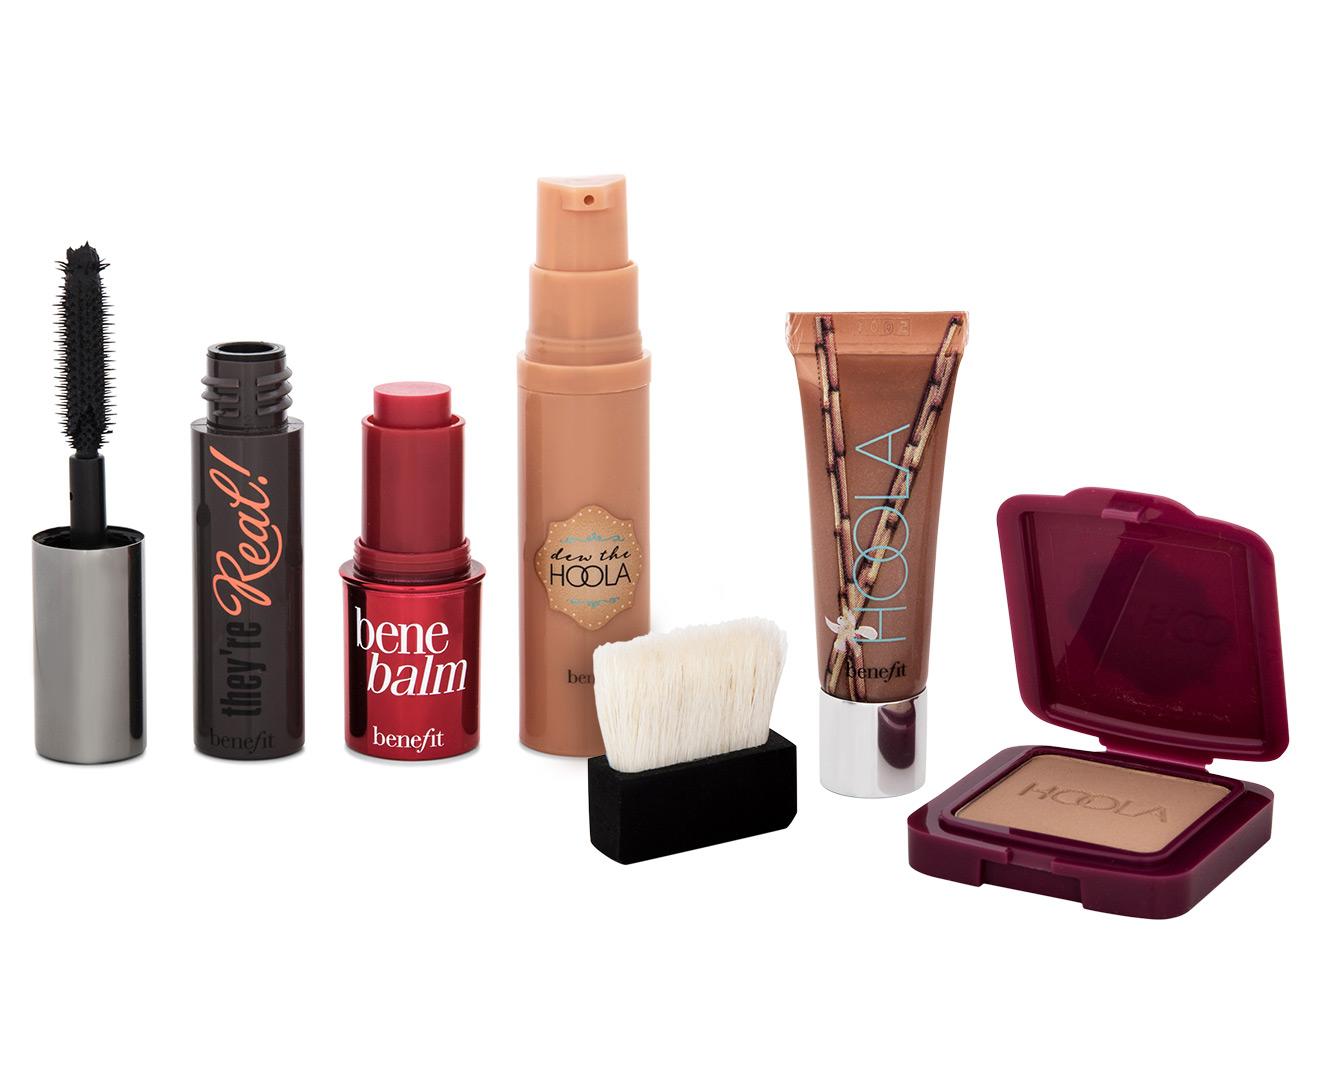 e91a016fac4 Benefit Do The Hoola Beyond Bronze Kit For Complexion, Lips & Eyes |  Catch.com.au